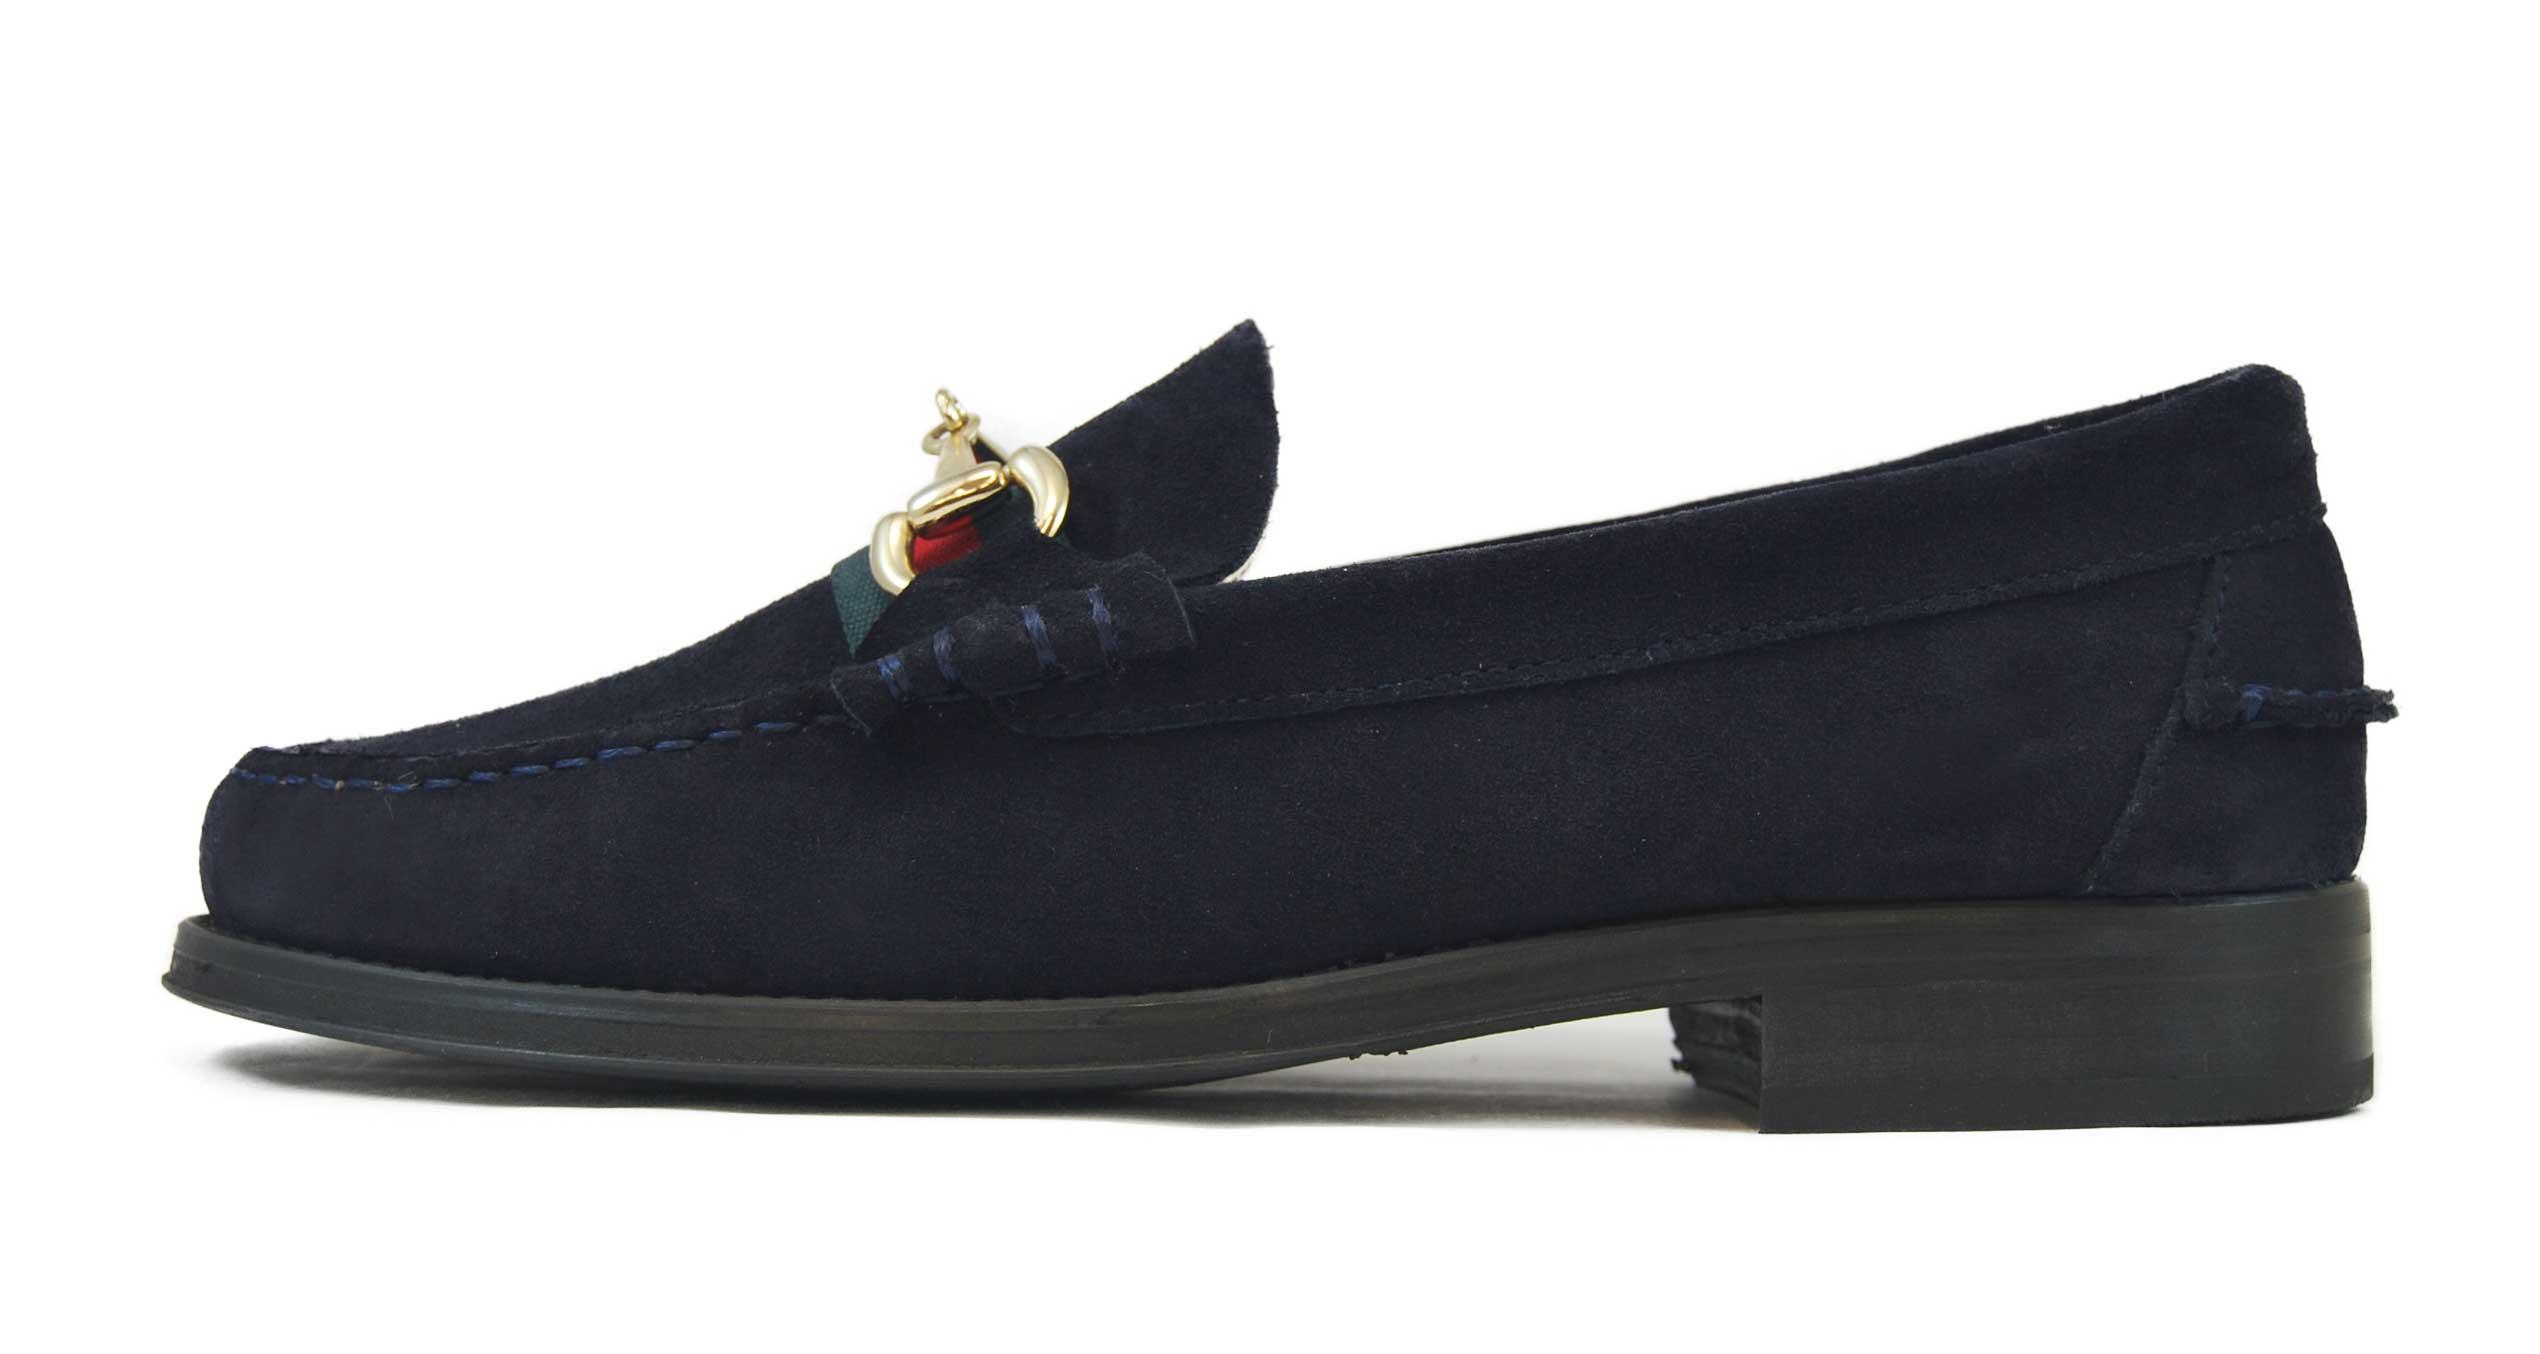 Foto 1 de Zapatos Ante Marino con Estribo